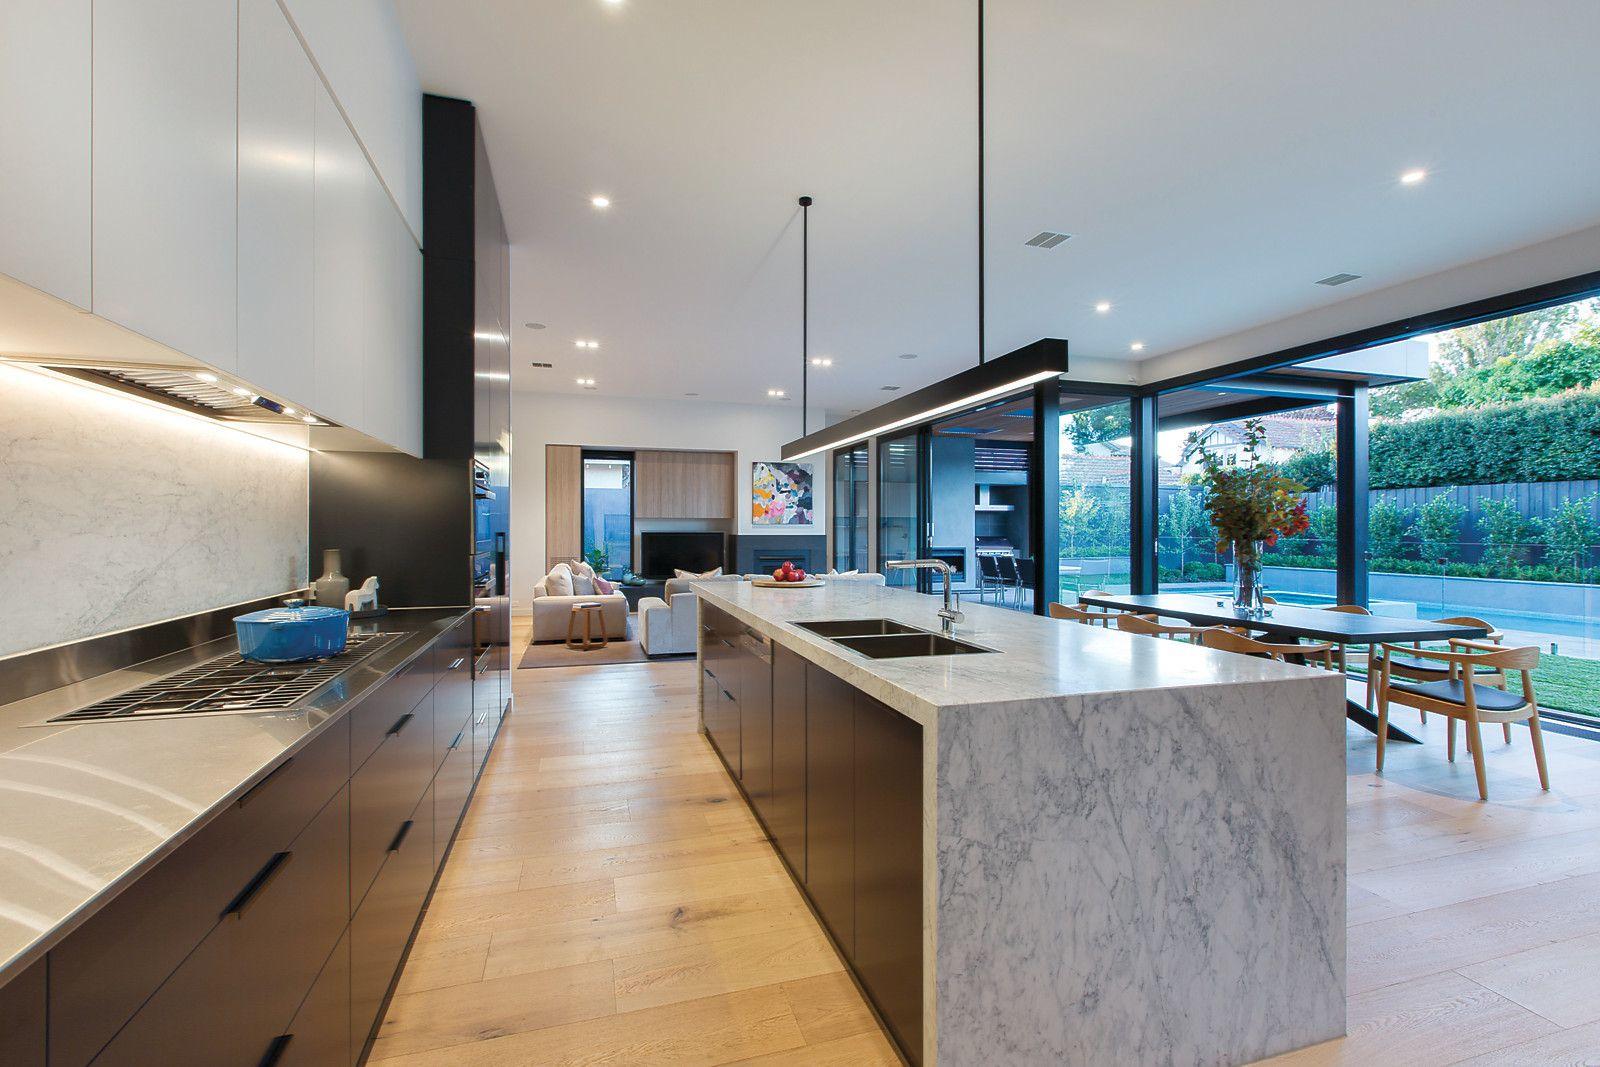 21 Kerferd Street Malvern East - Marshall White | Architecture ...